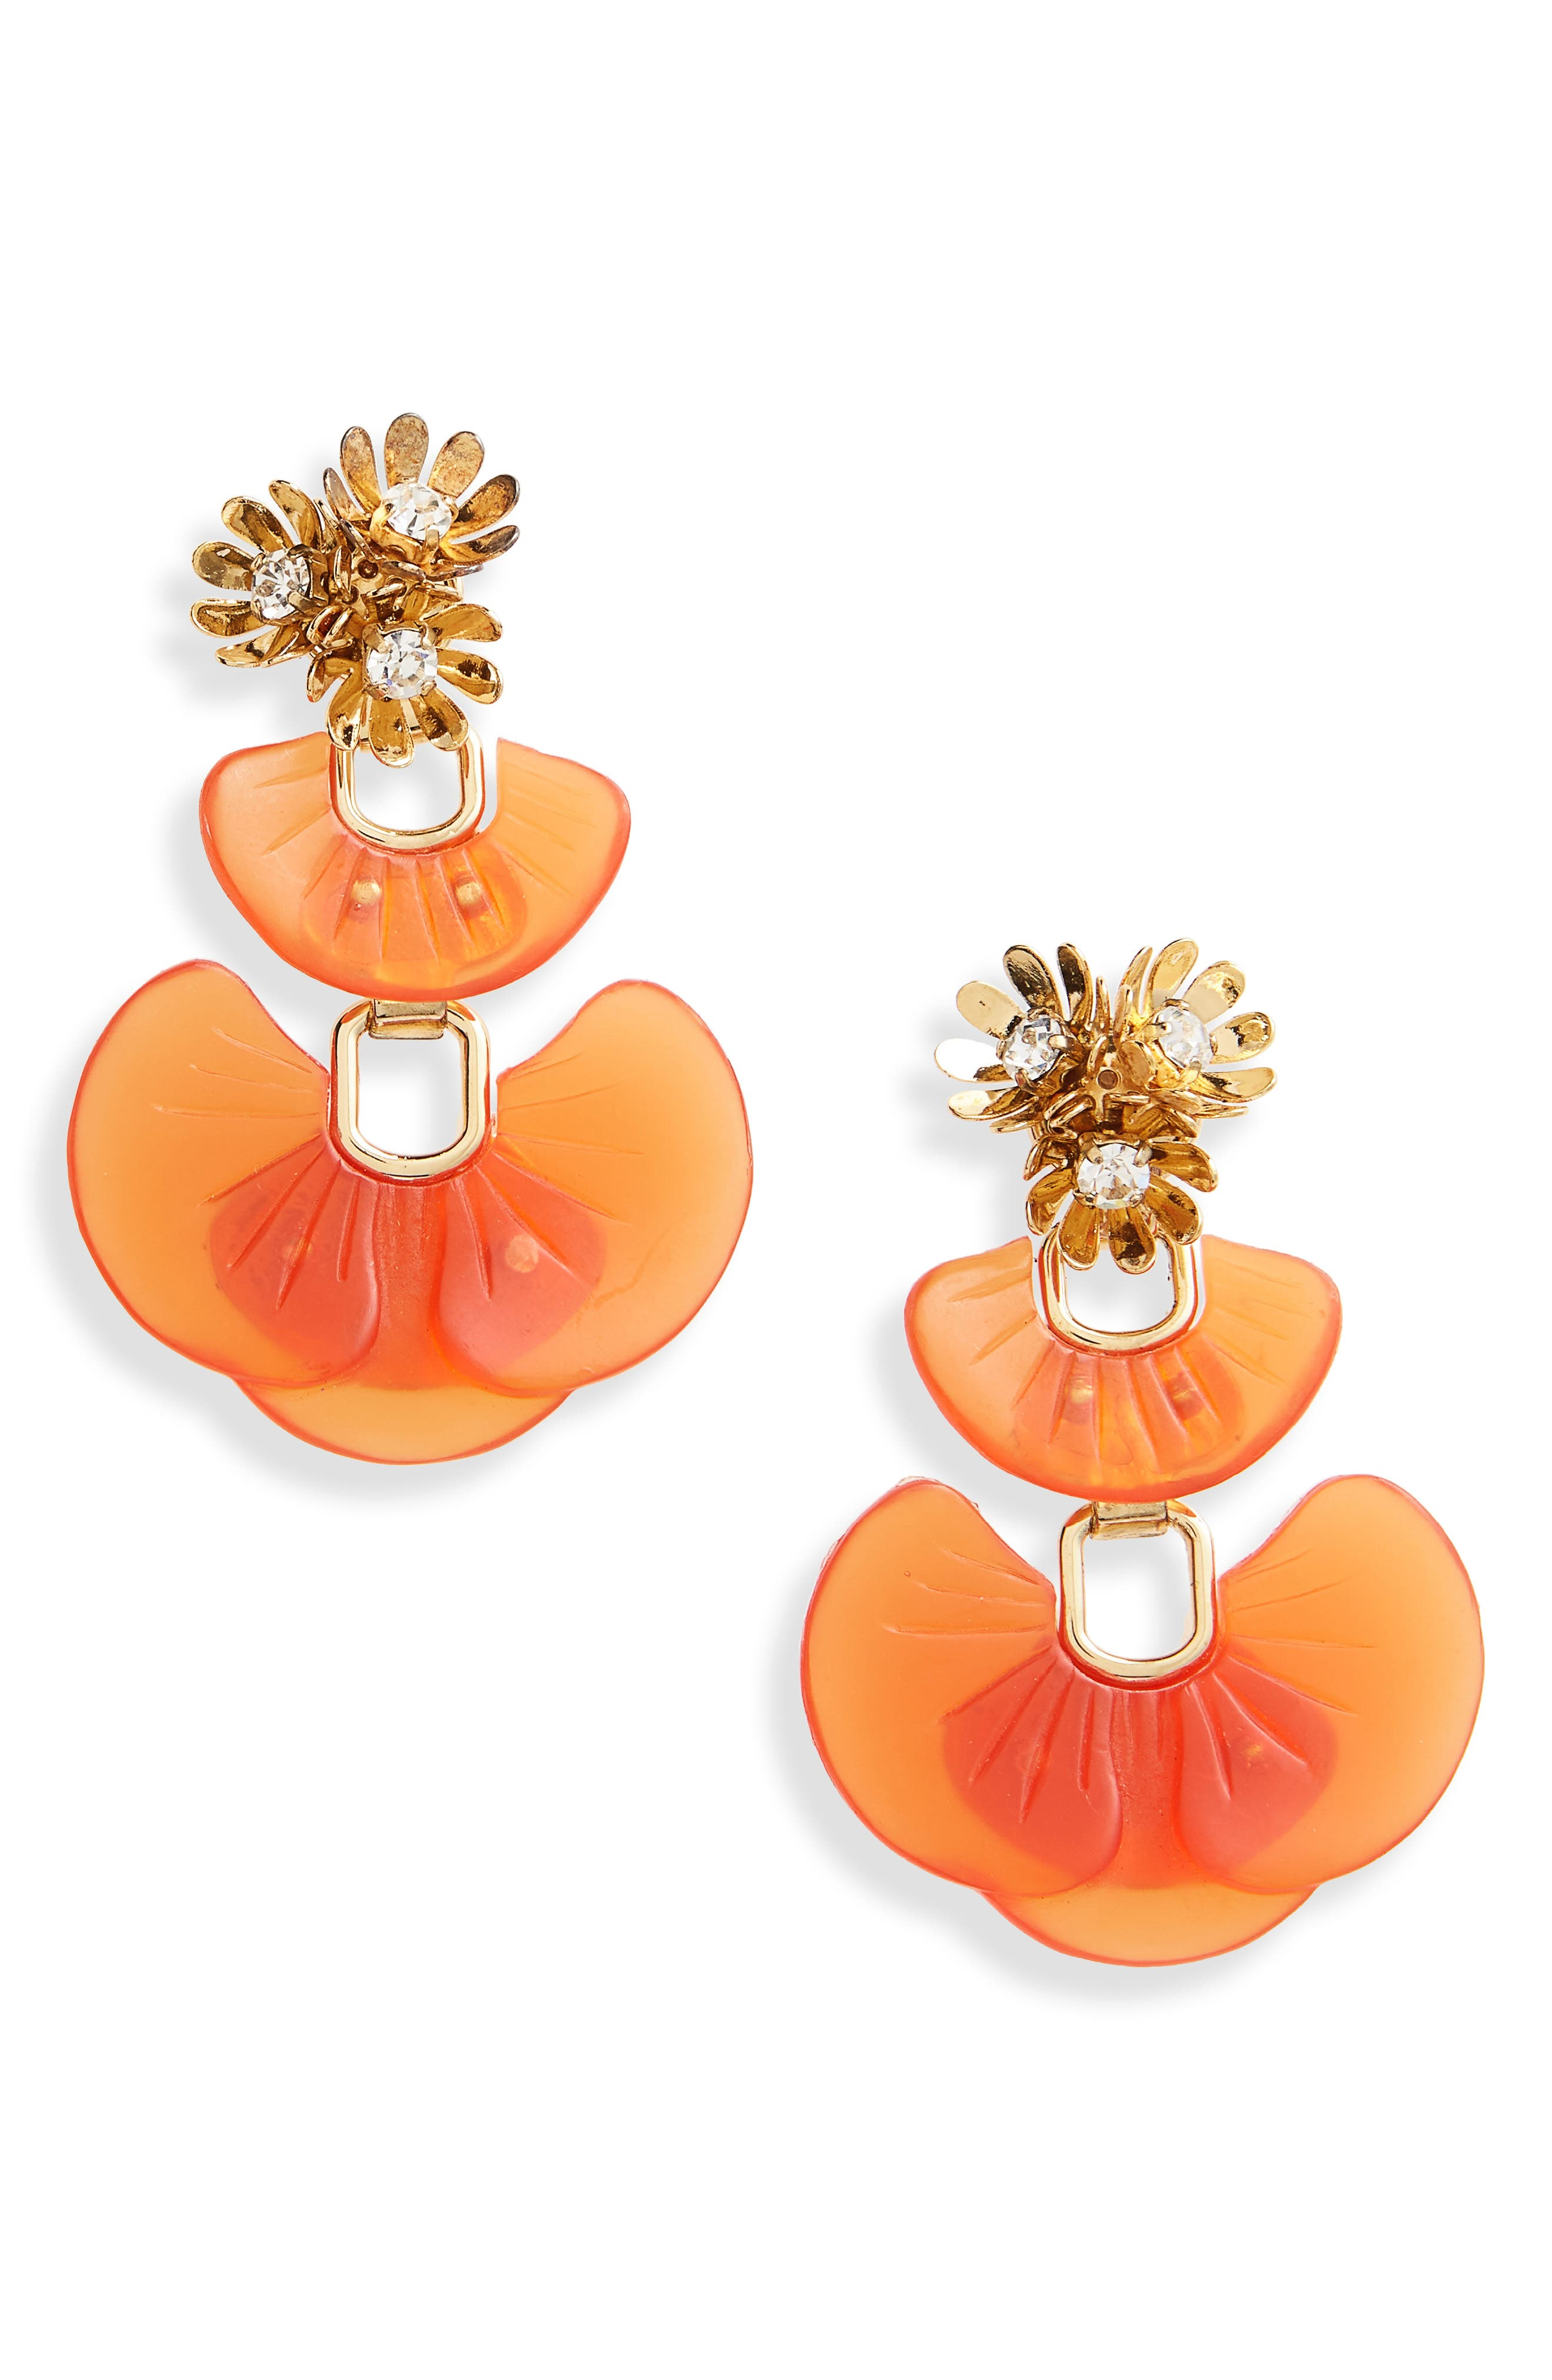 Island Drop Earrings,                         Main,                         color, 800